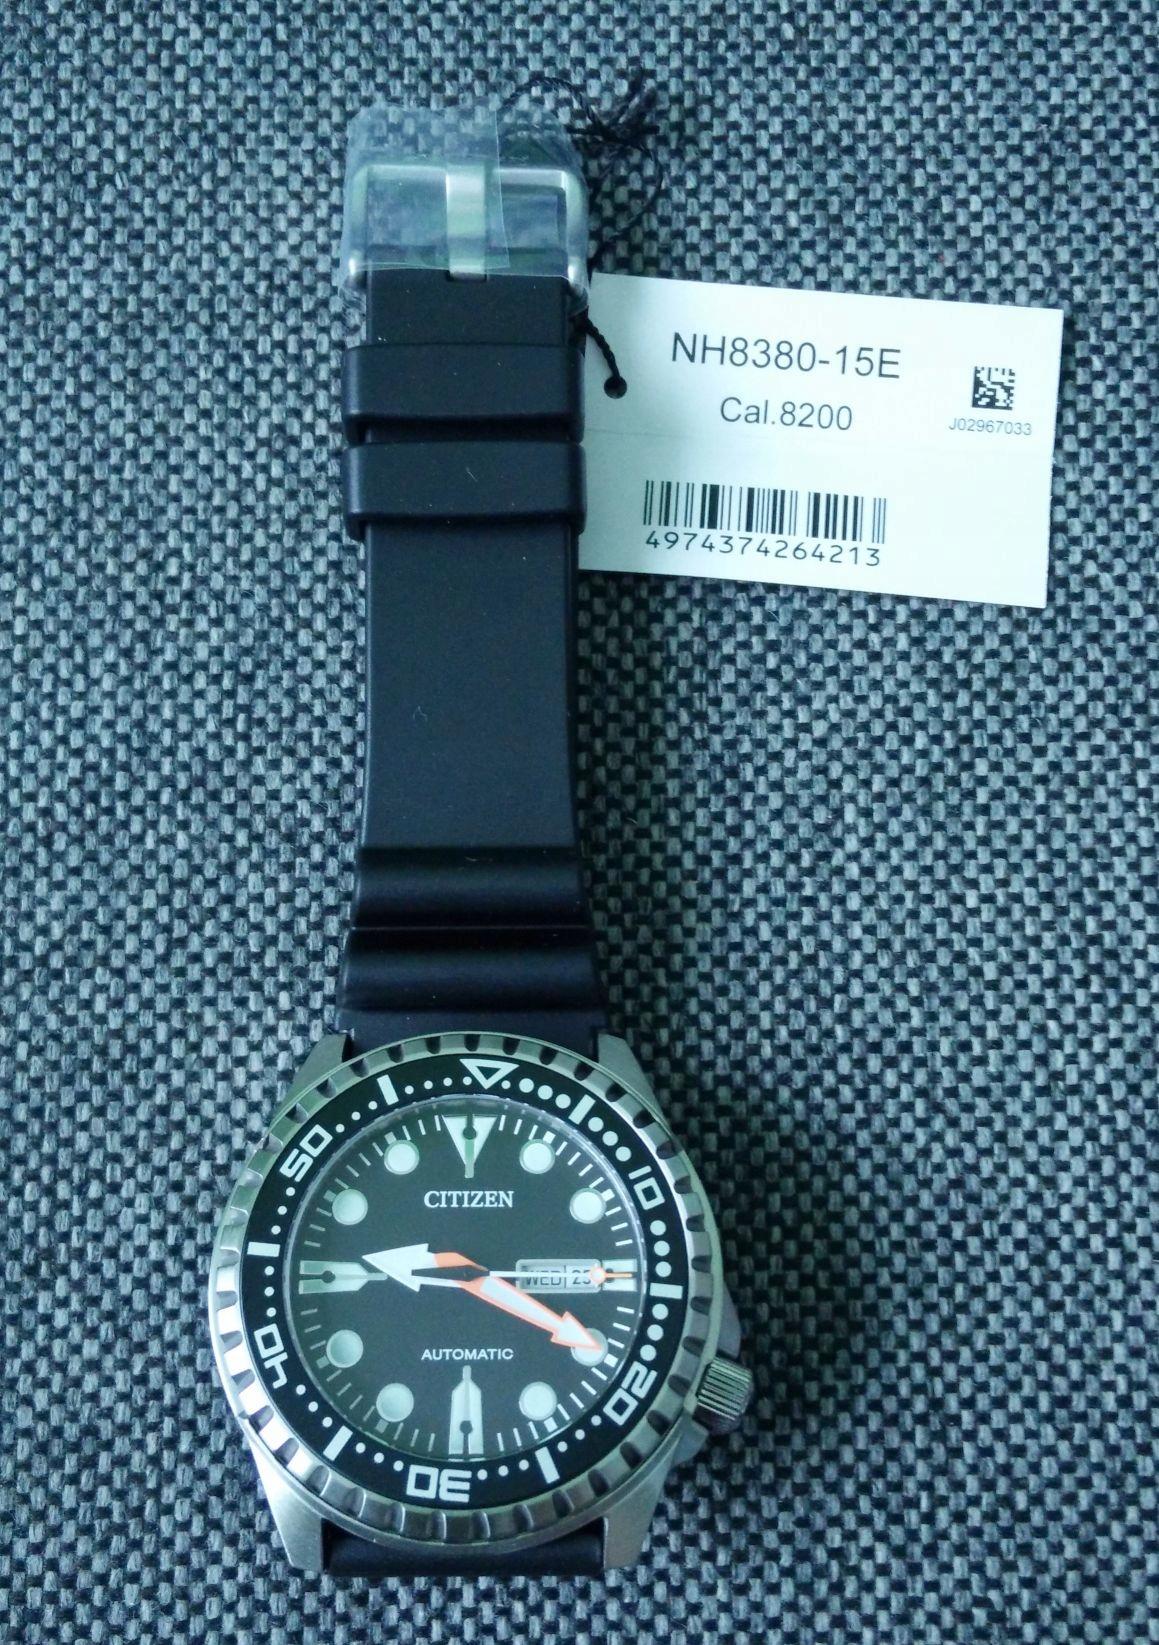 NOWY zegarek Citizen NH8380 Automat